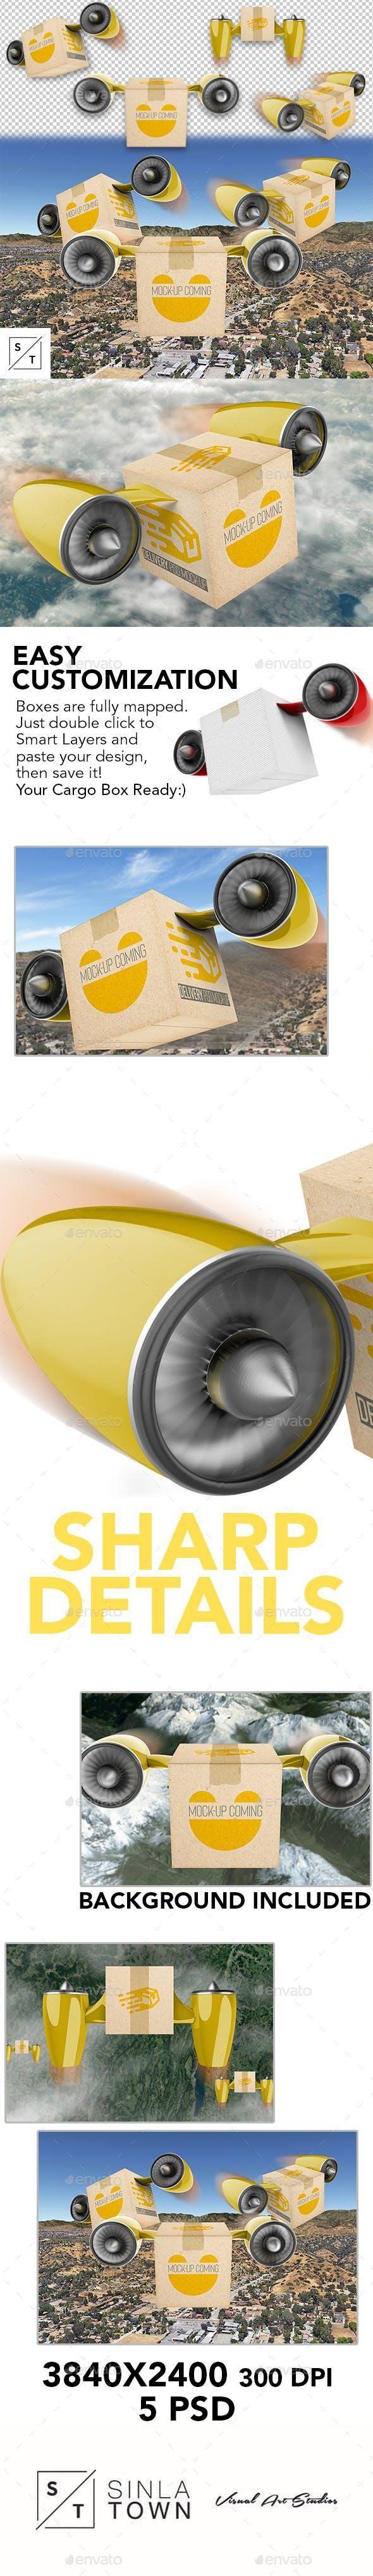 Download Delivery Cargo Drone Box Psd Mockup Mockup Psd Mockup Psd